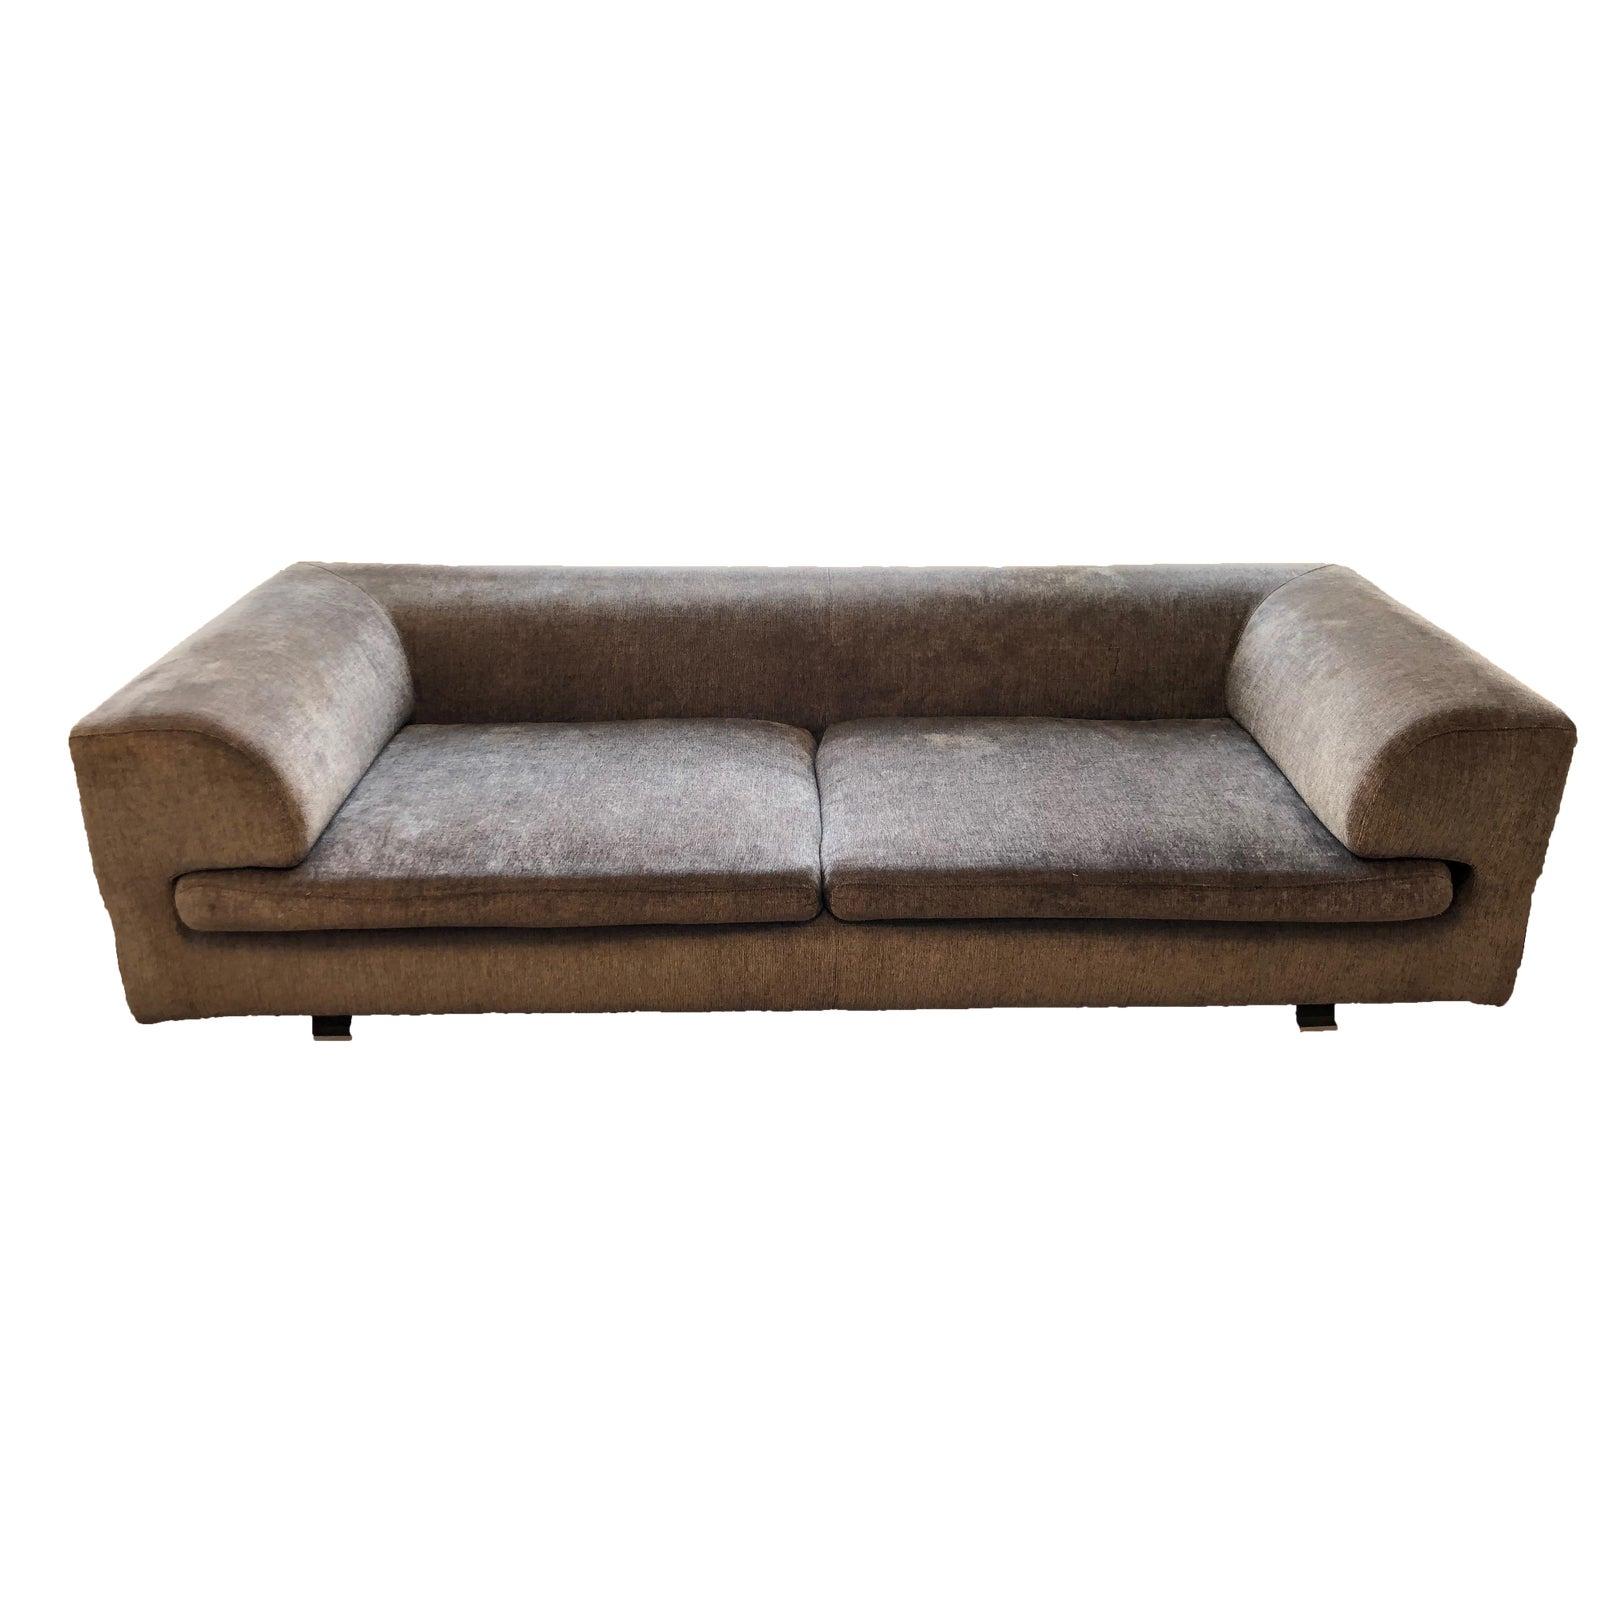 Roche Bobois Elixir Model Upholstered 4-Seat Sofa   Chairish